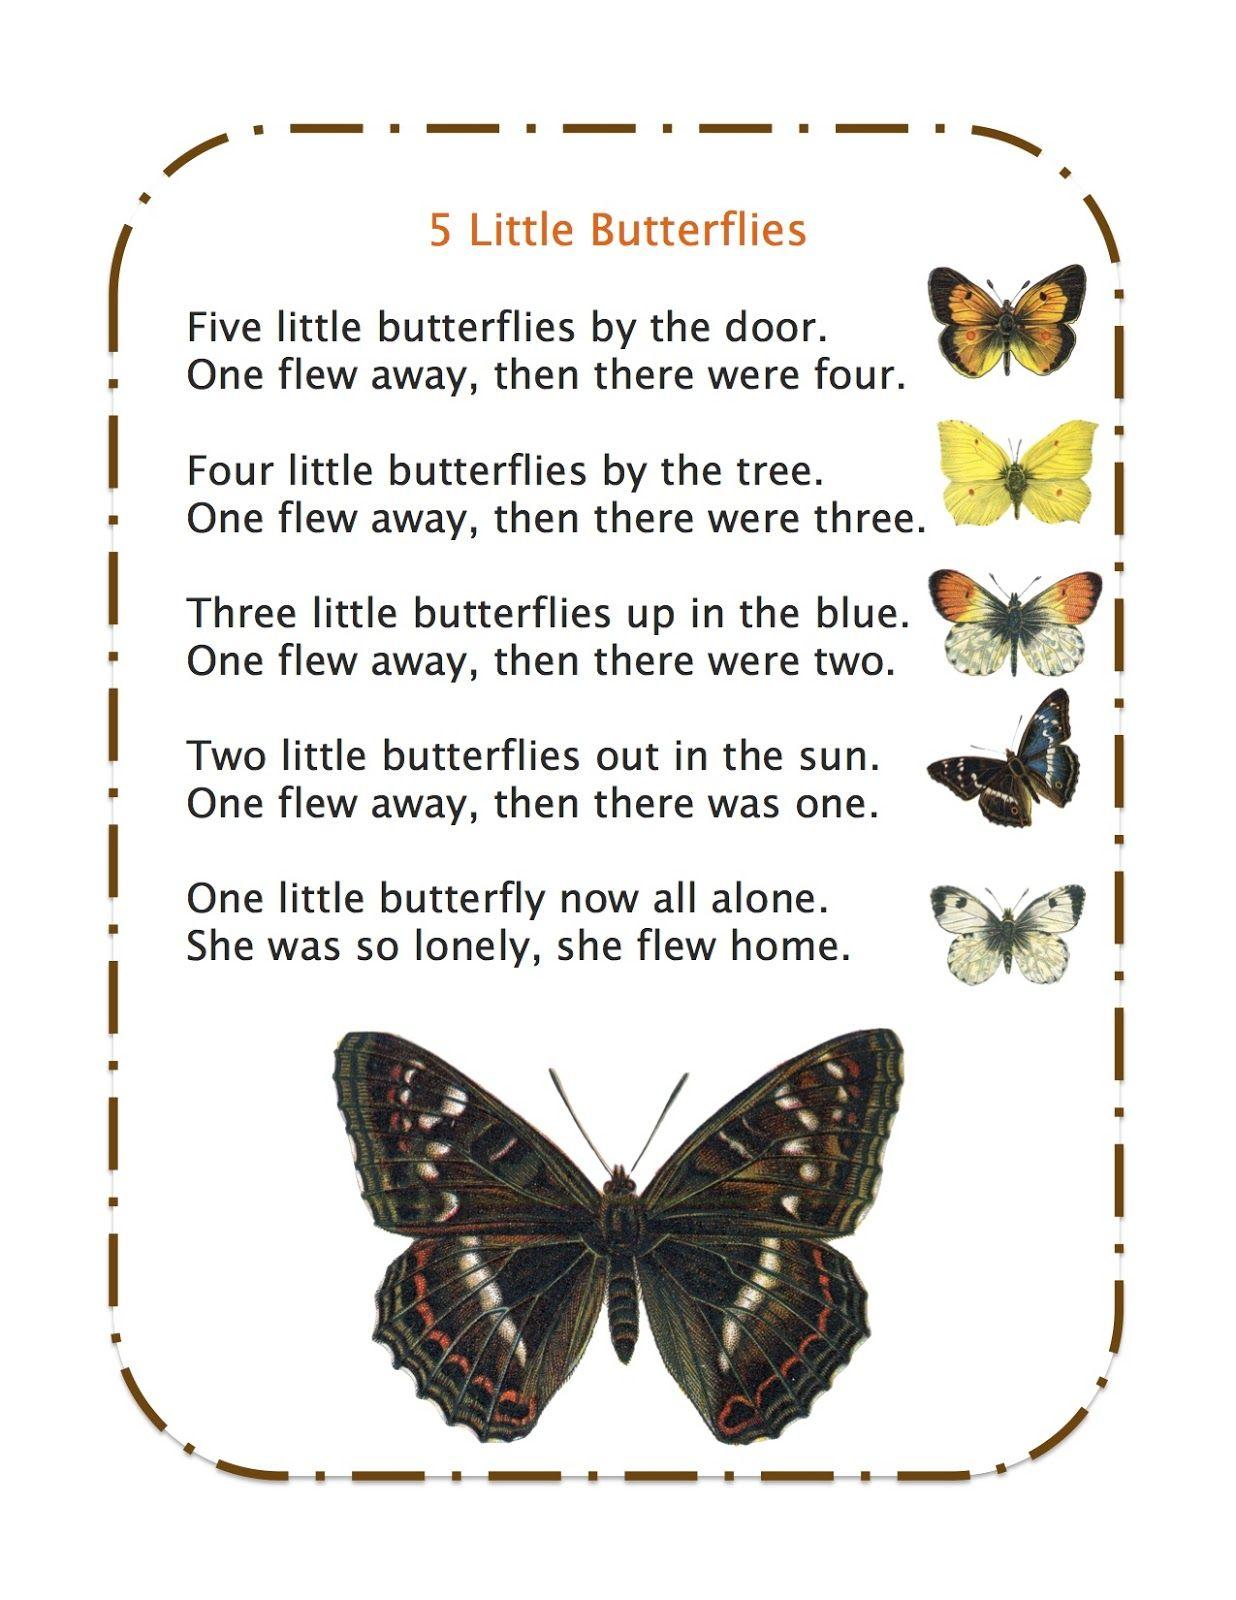 Preschool Butterfly Songs : preschool, butterfly, songs, 5+Little+Butterflies.jpg, 1,236×1,600, Pixels, Preschool, Songs,, Butterfly, School, Songs